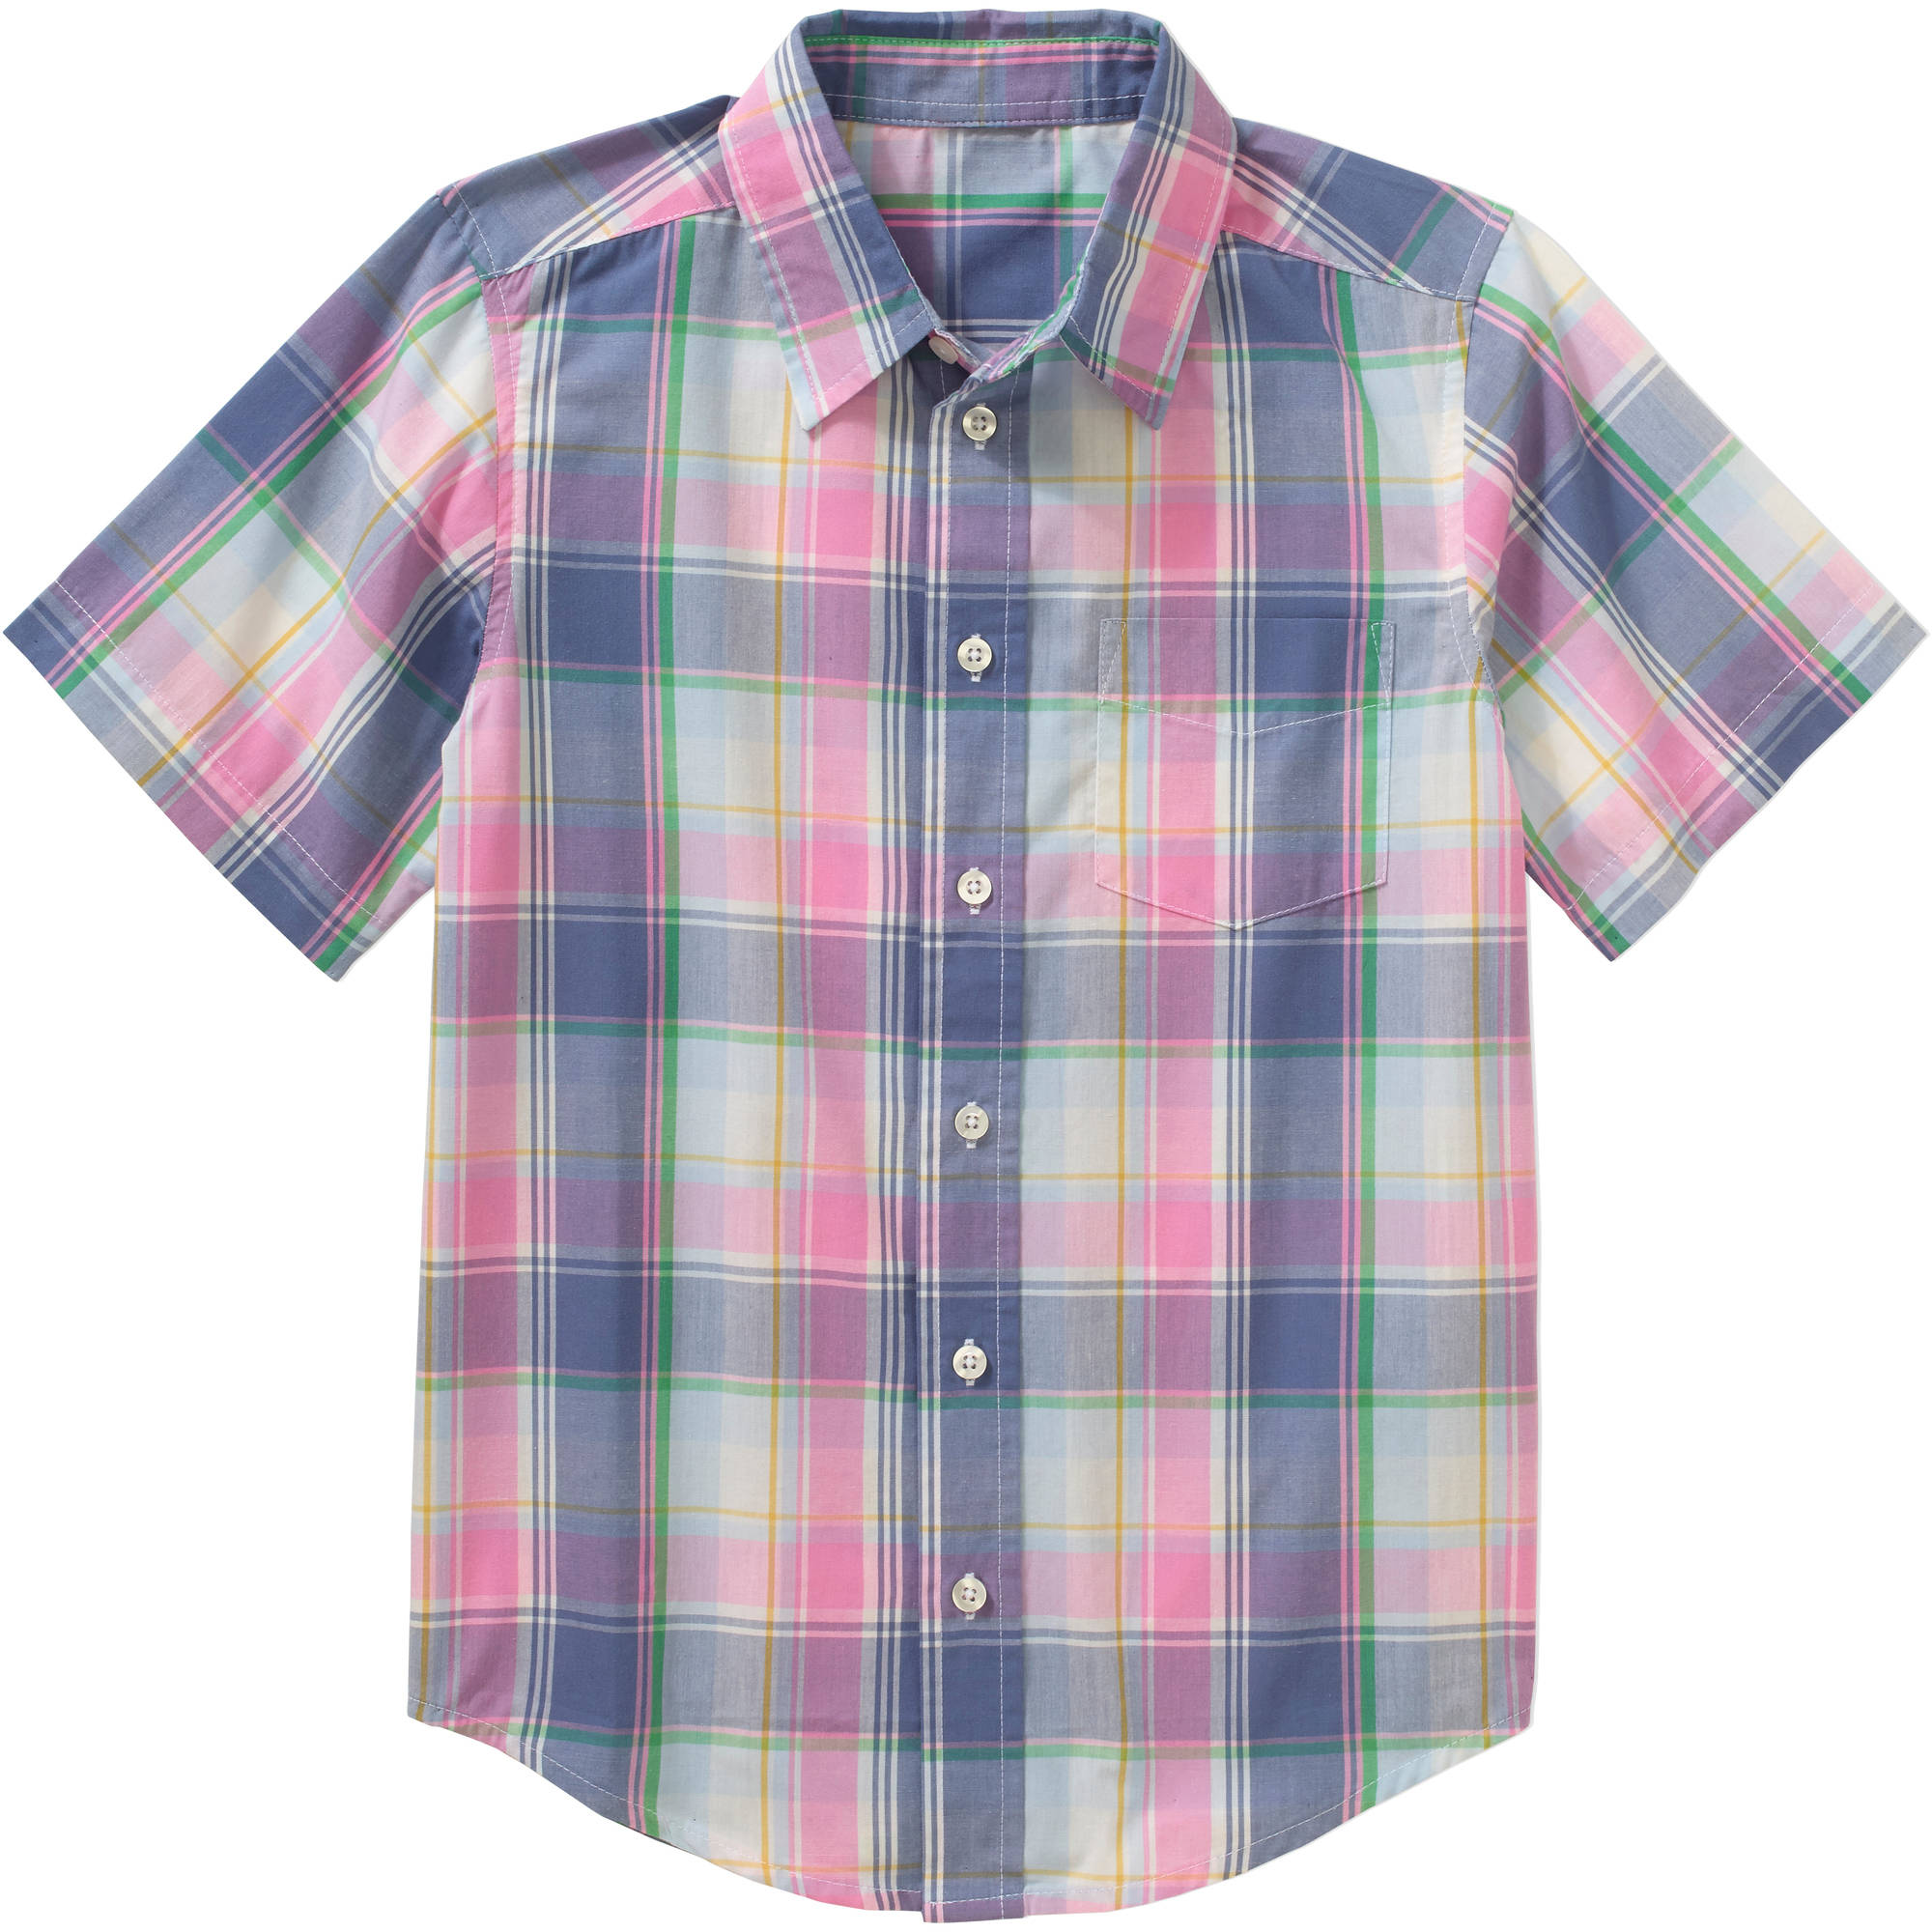 Boys' Short Sleeve Woven Plaid Shirt